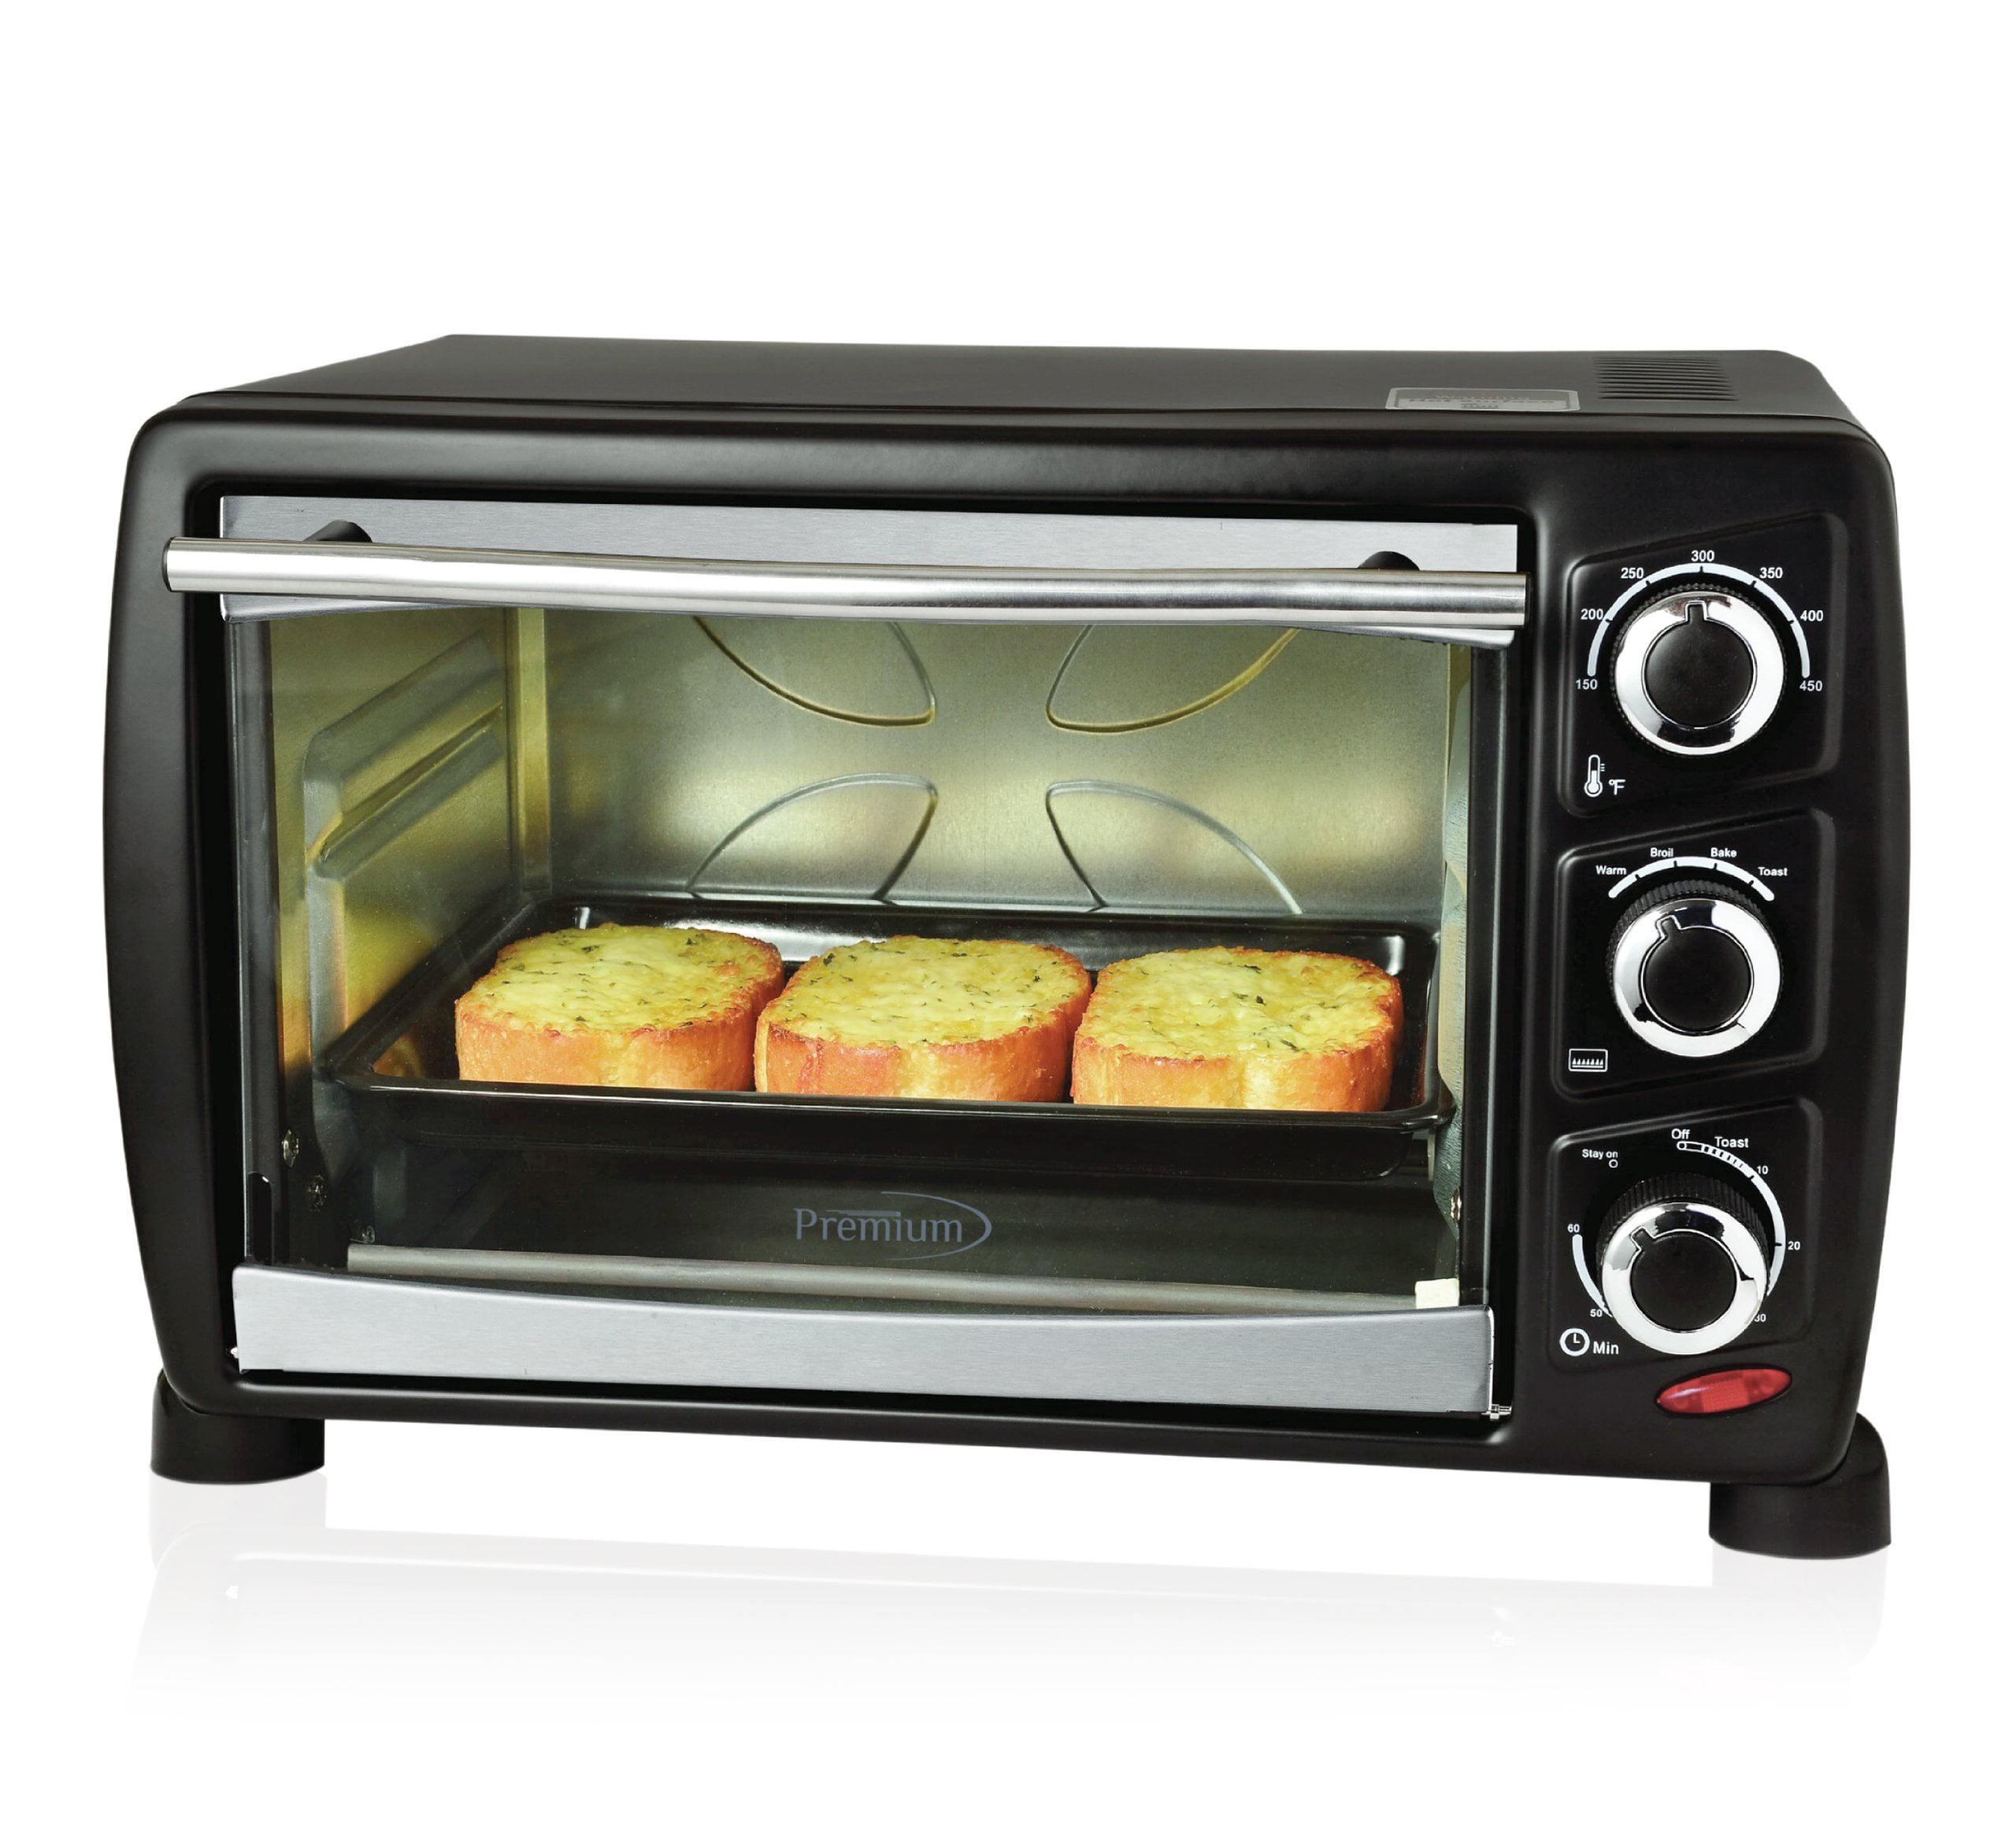 Premium 6-Slices Toaster Oven (pto169)